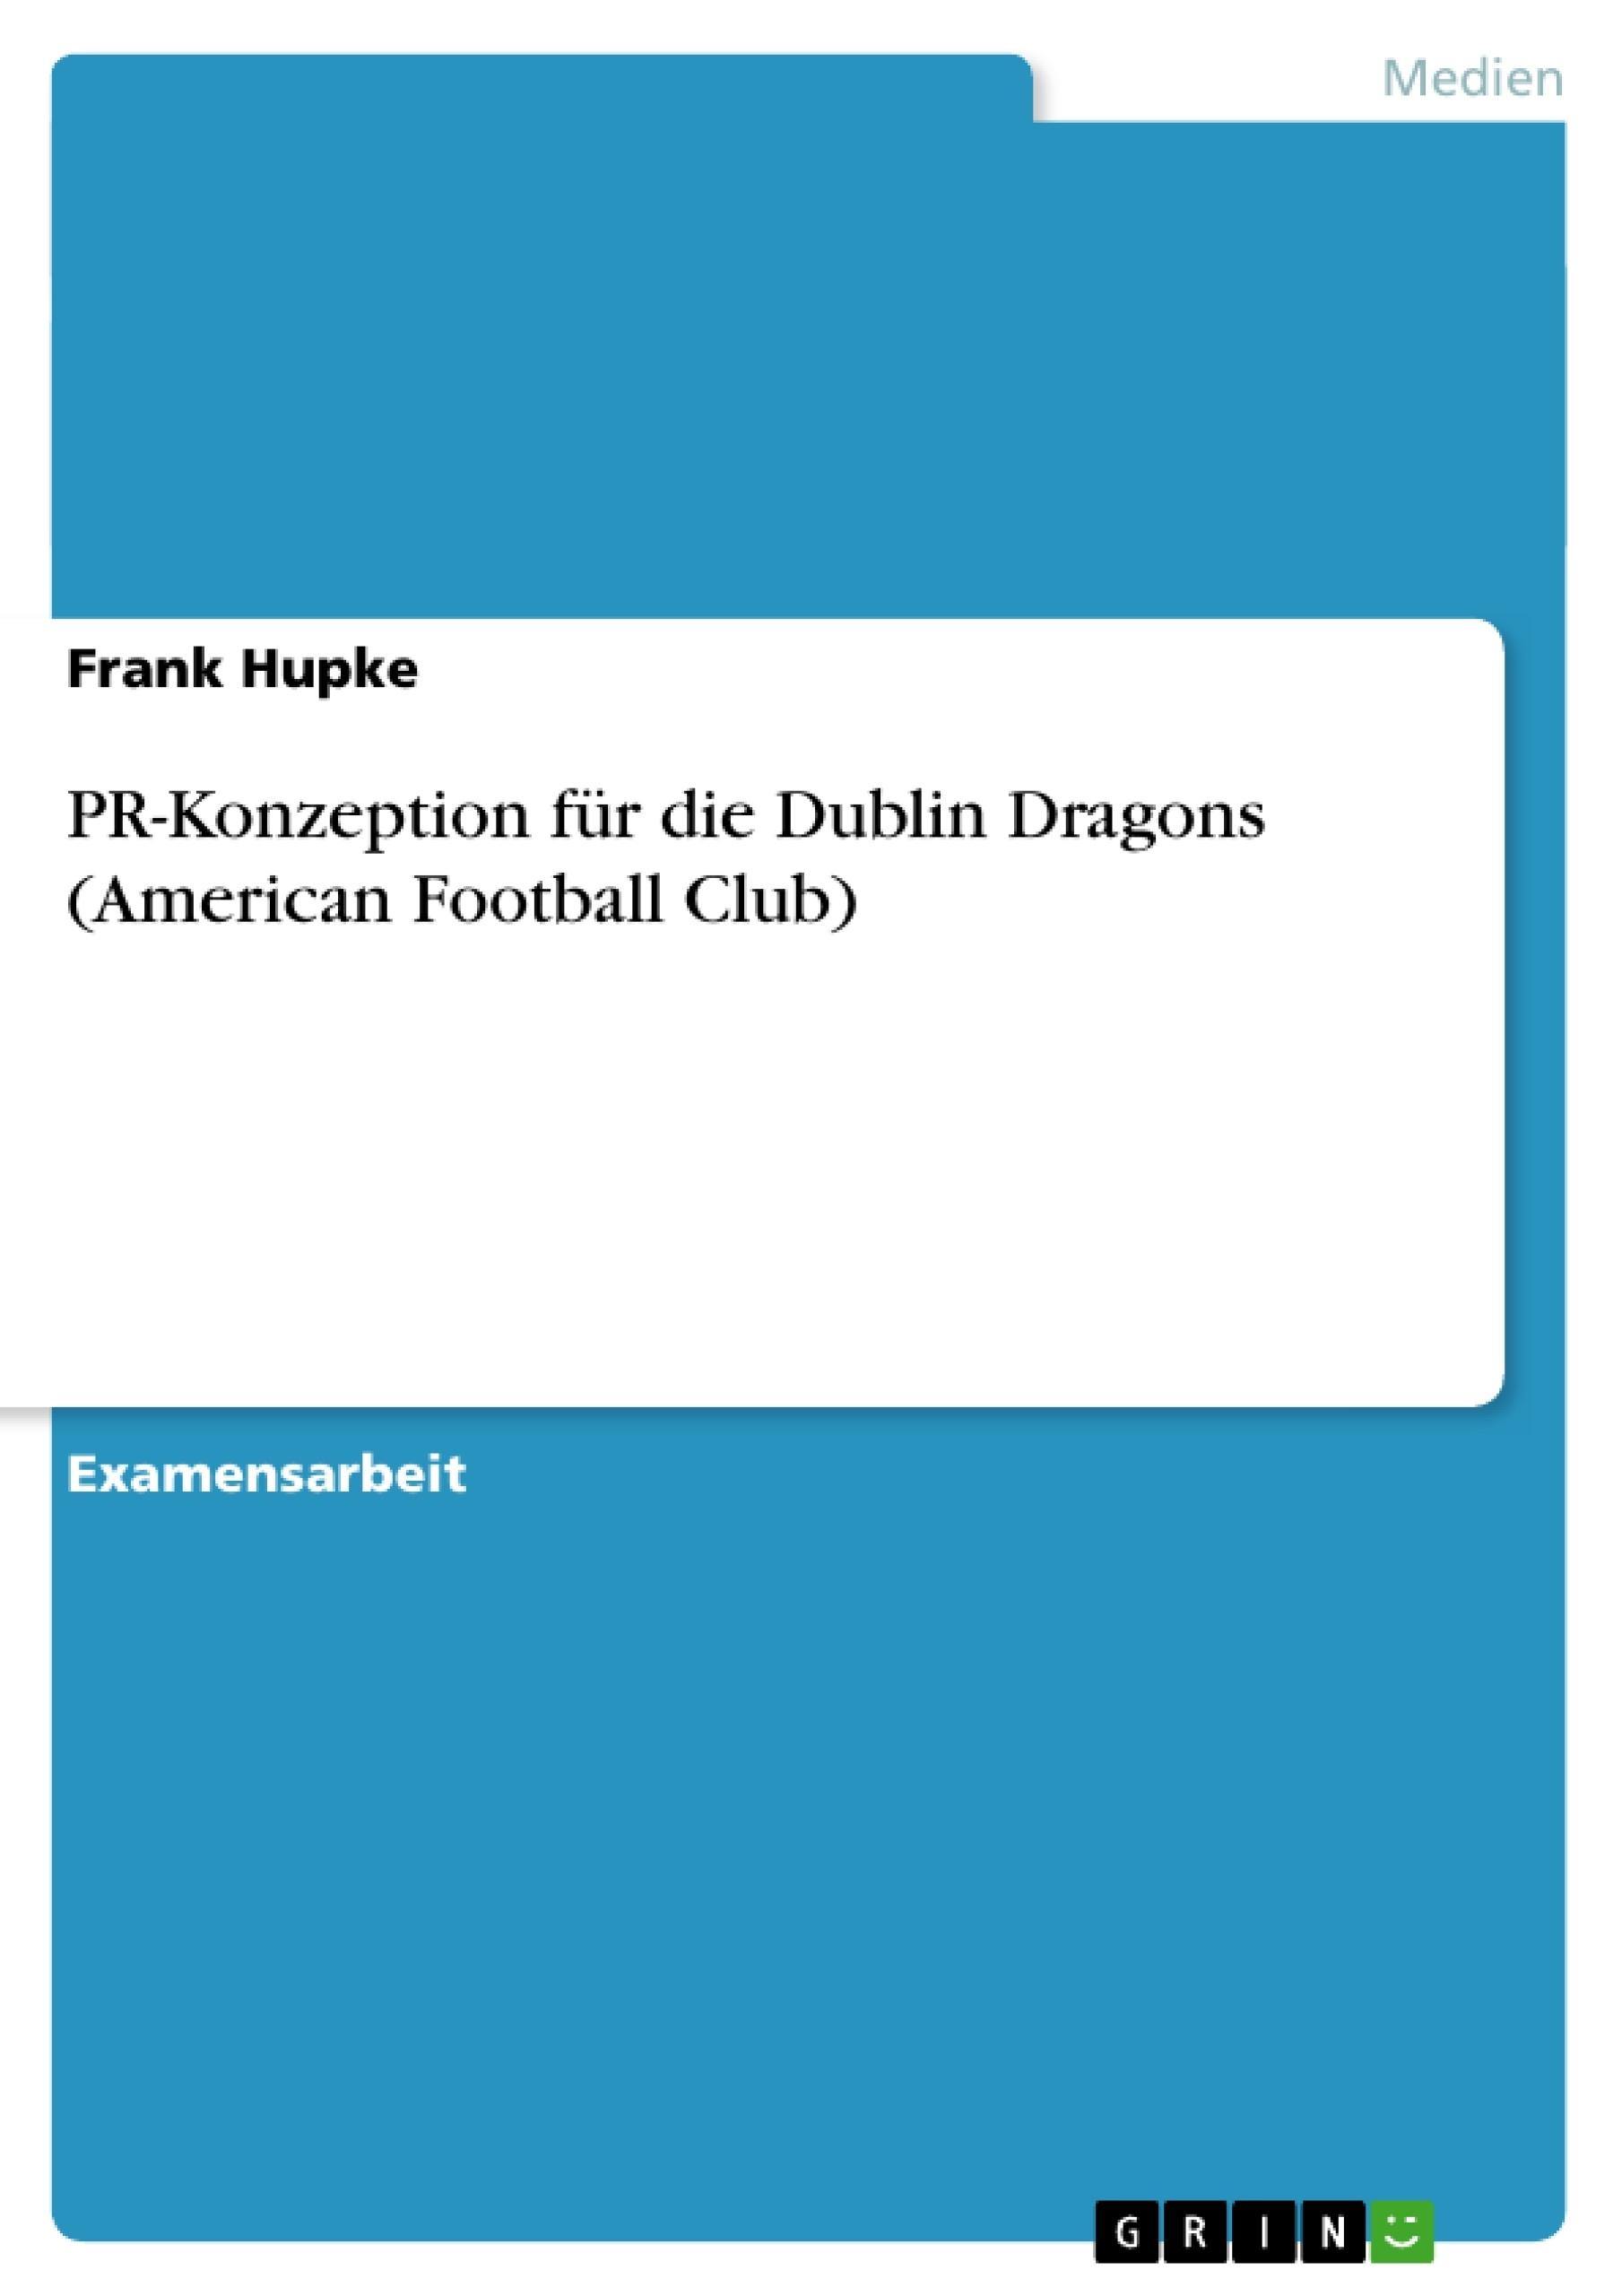 Titel: PR-Konzeption für die Dublin Dragons (American Football Club)